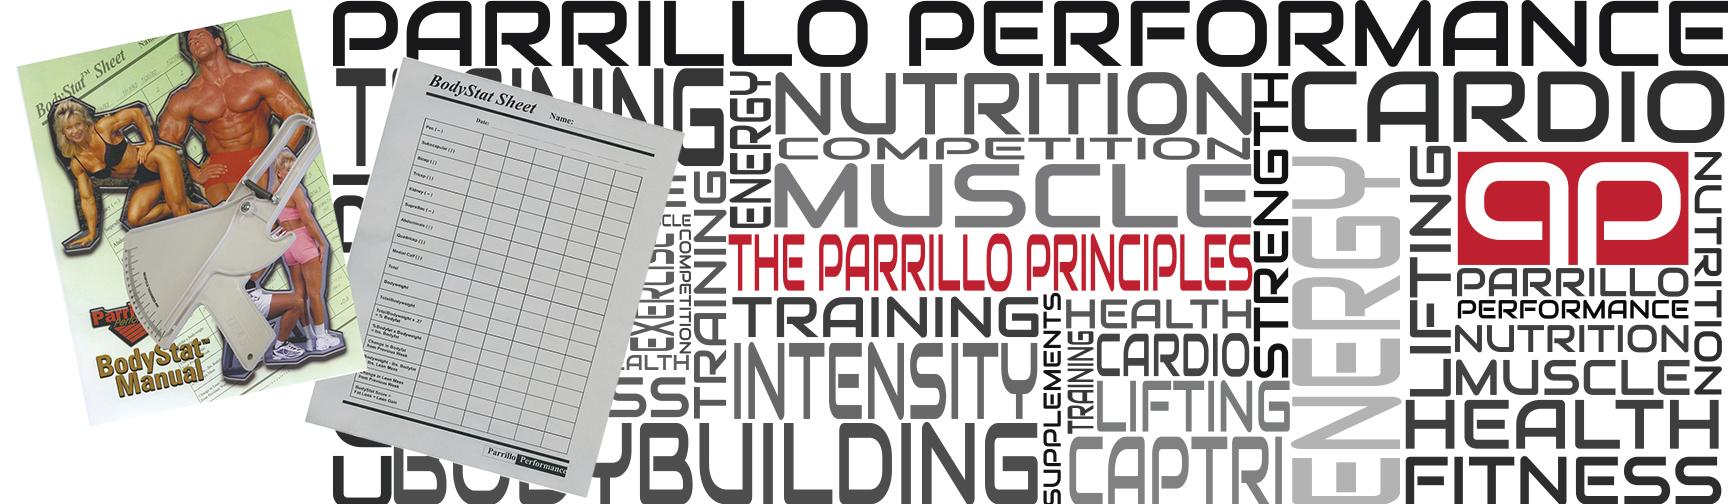 parrillo-principles-April-2016-banner